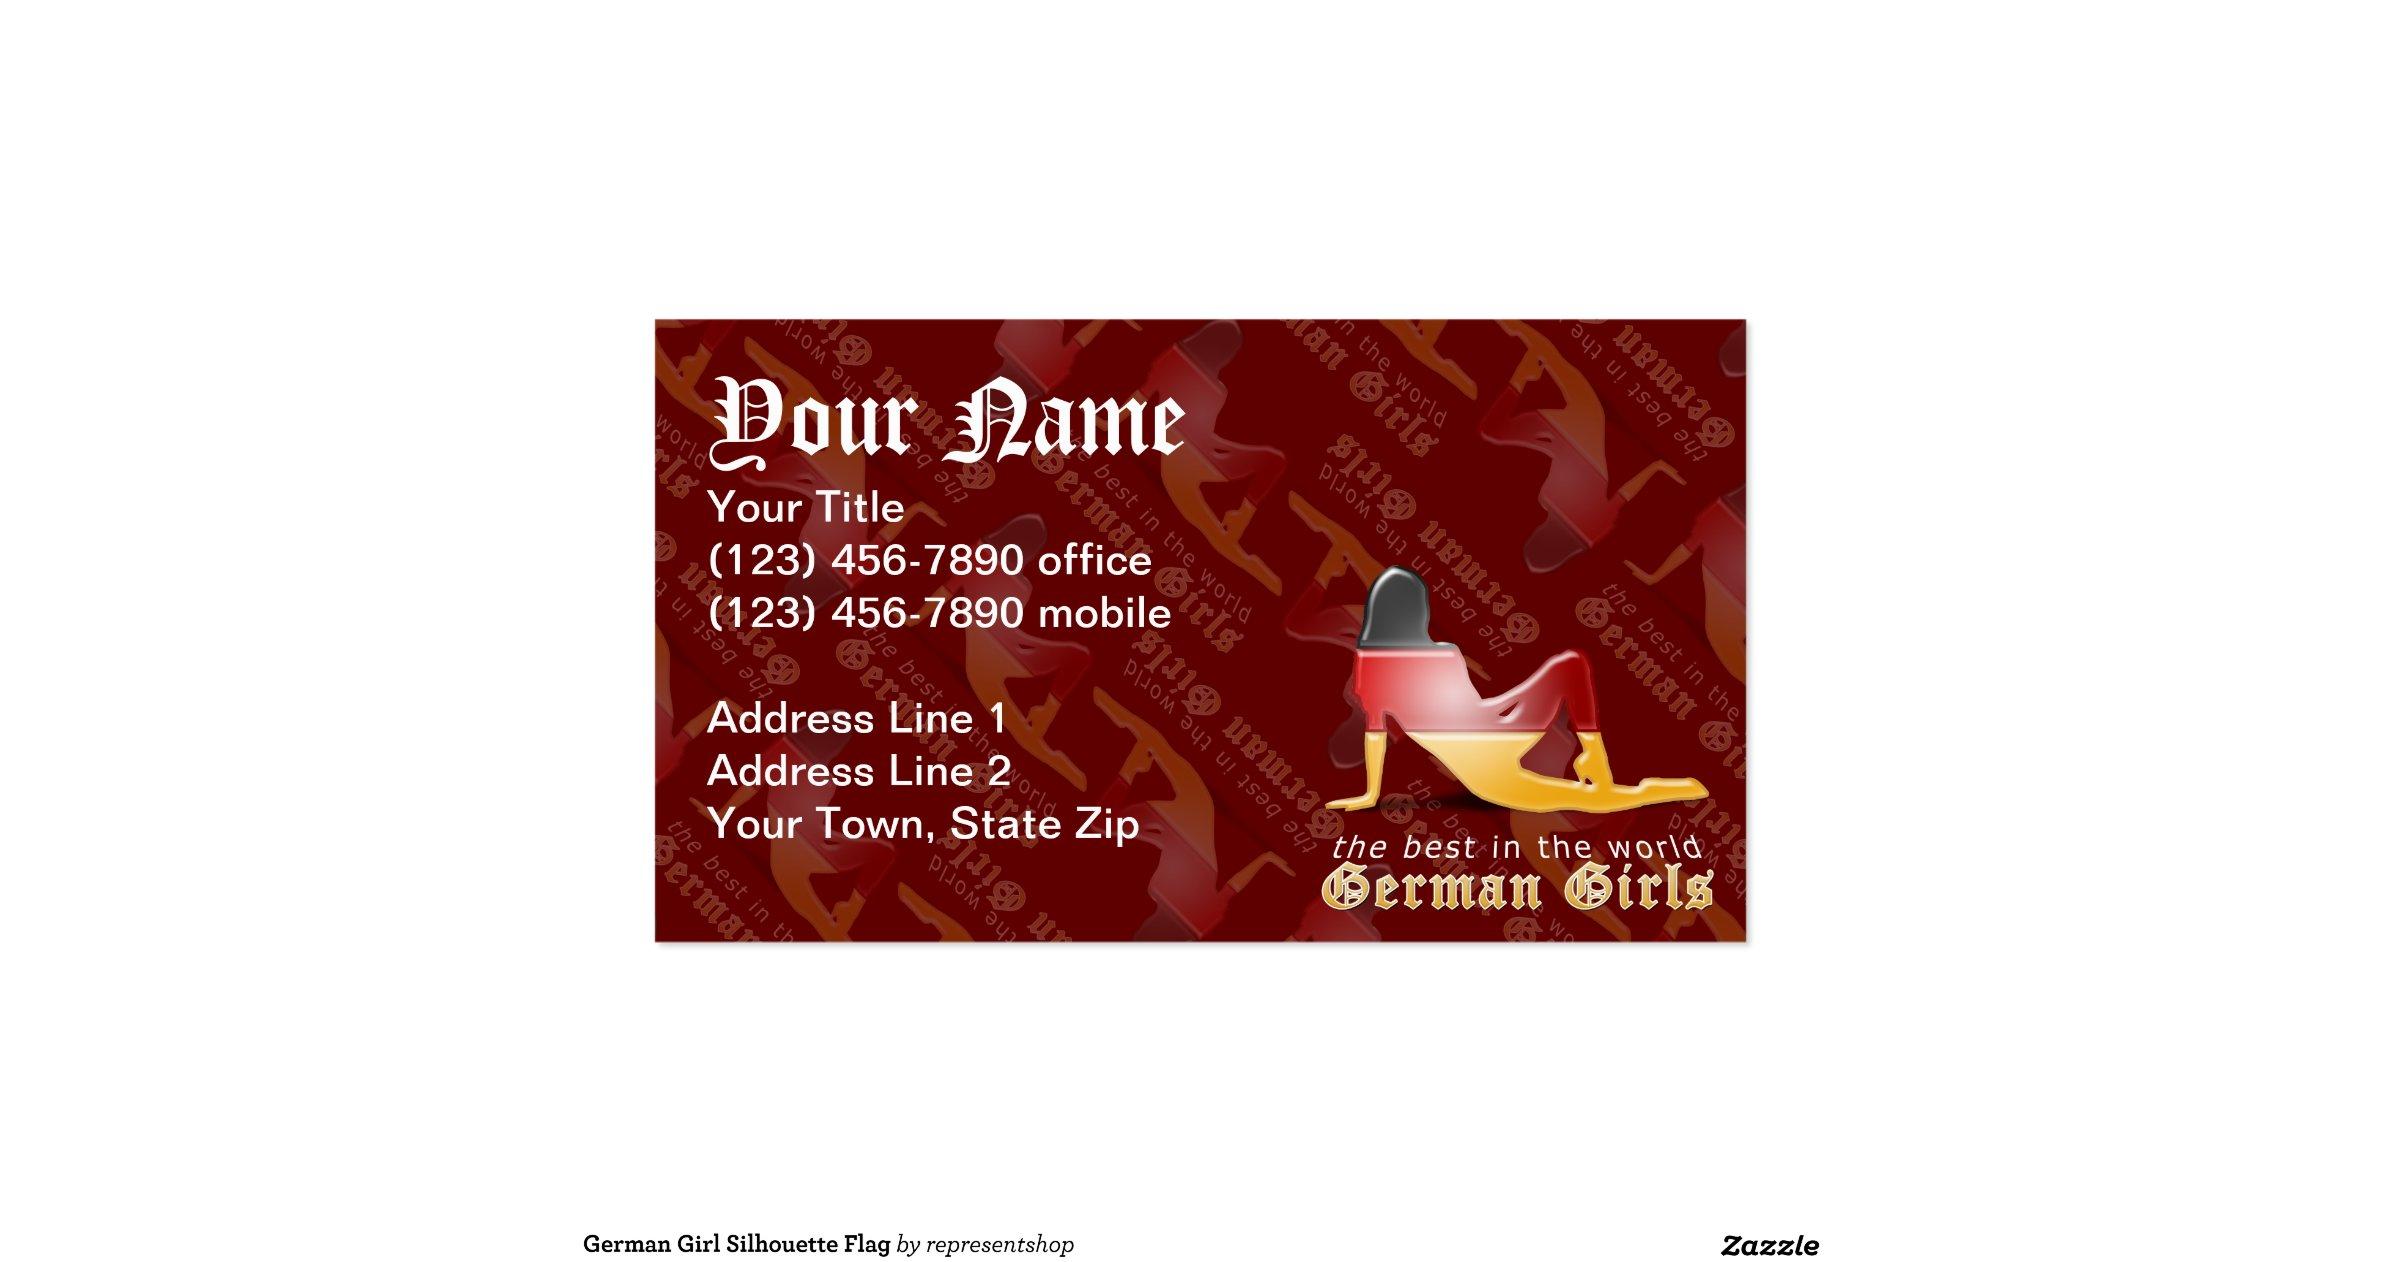 german girl silhouette flag pack of standard business cards zazzle. Black Bedroom Furniture Sets. Home Design Ideas